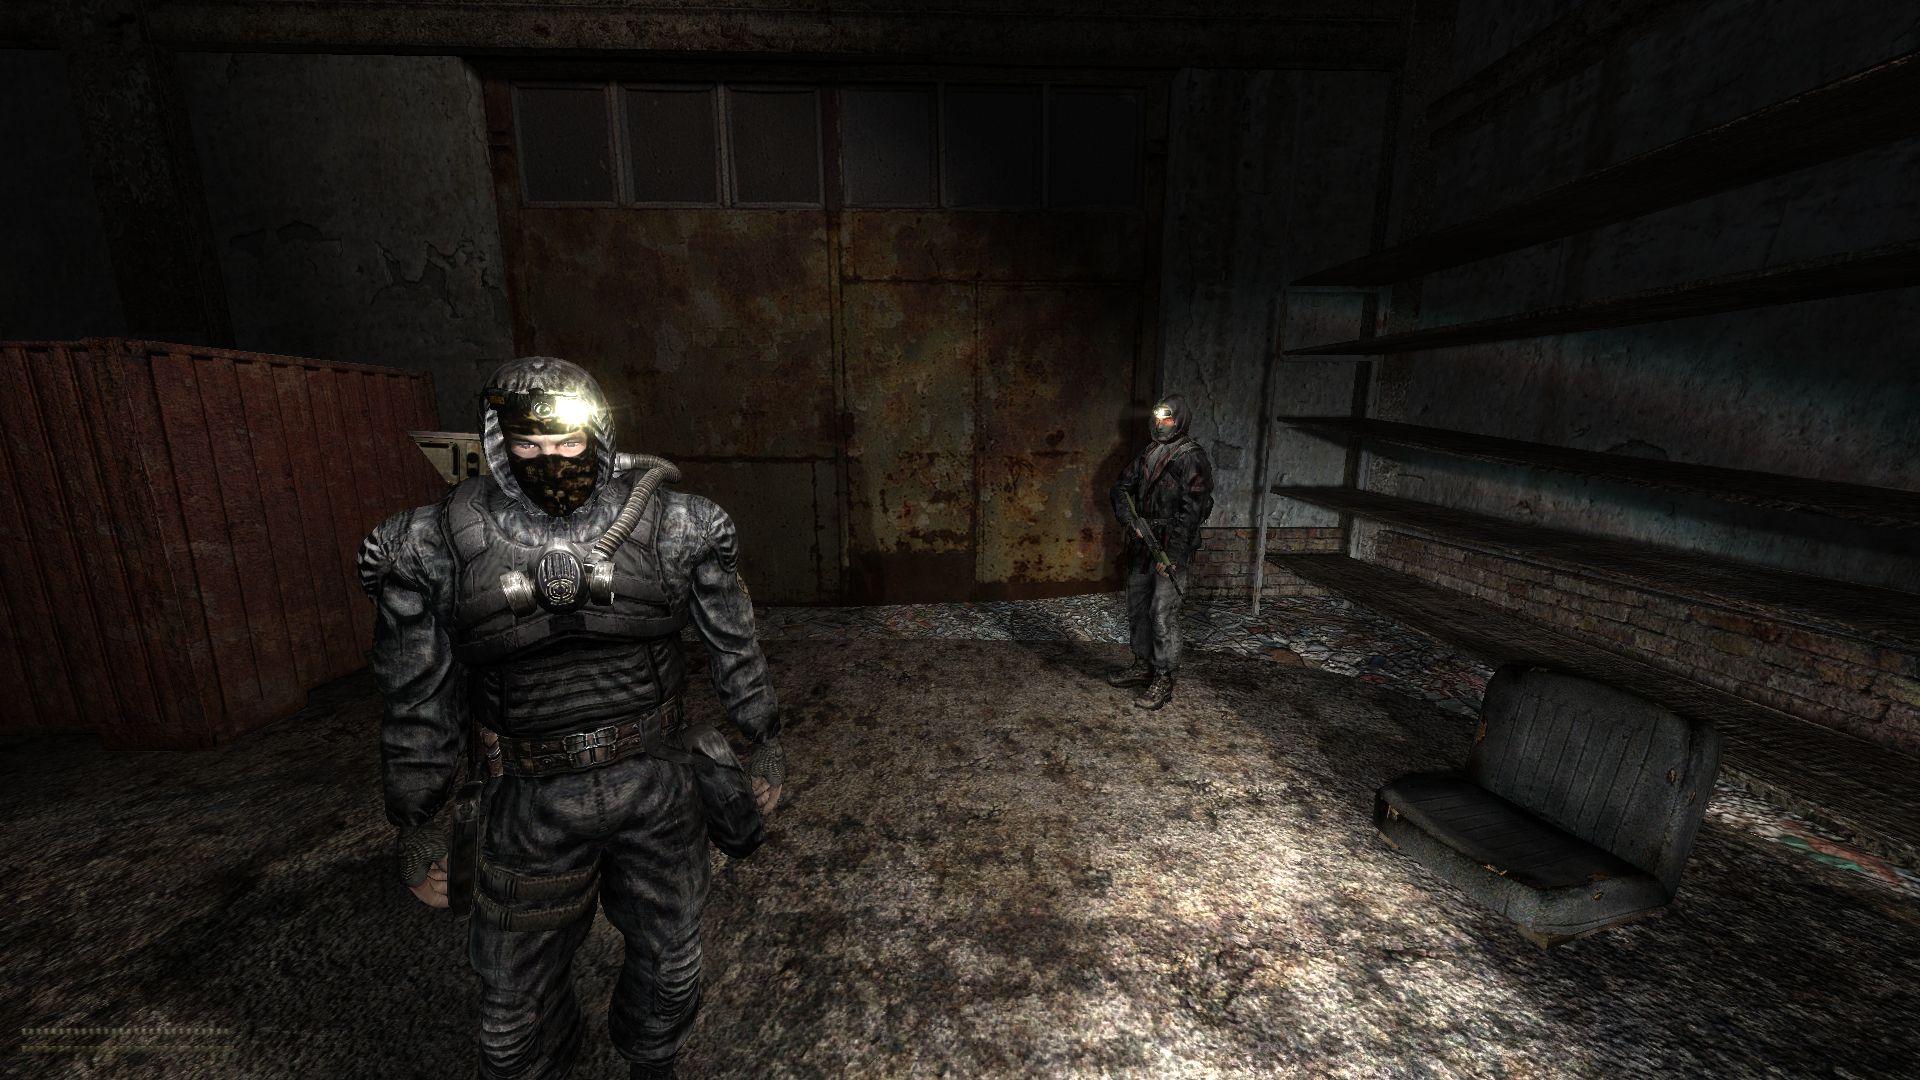 00013.Jpg - S.T.A.L.K.E.R.: Call of Pripyat